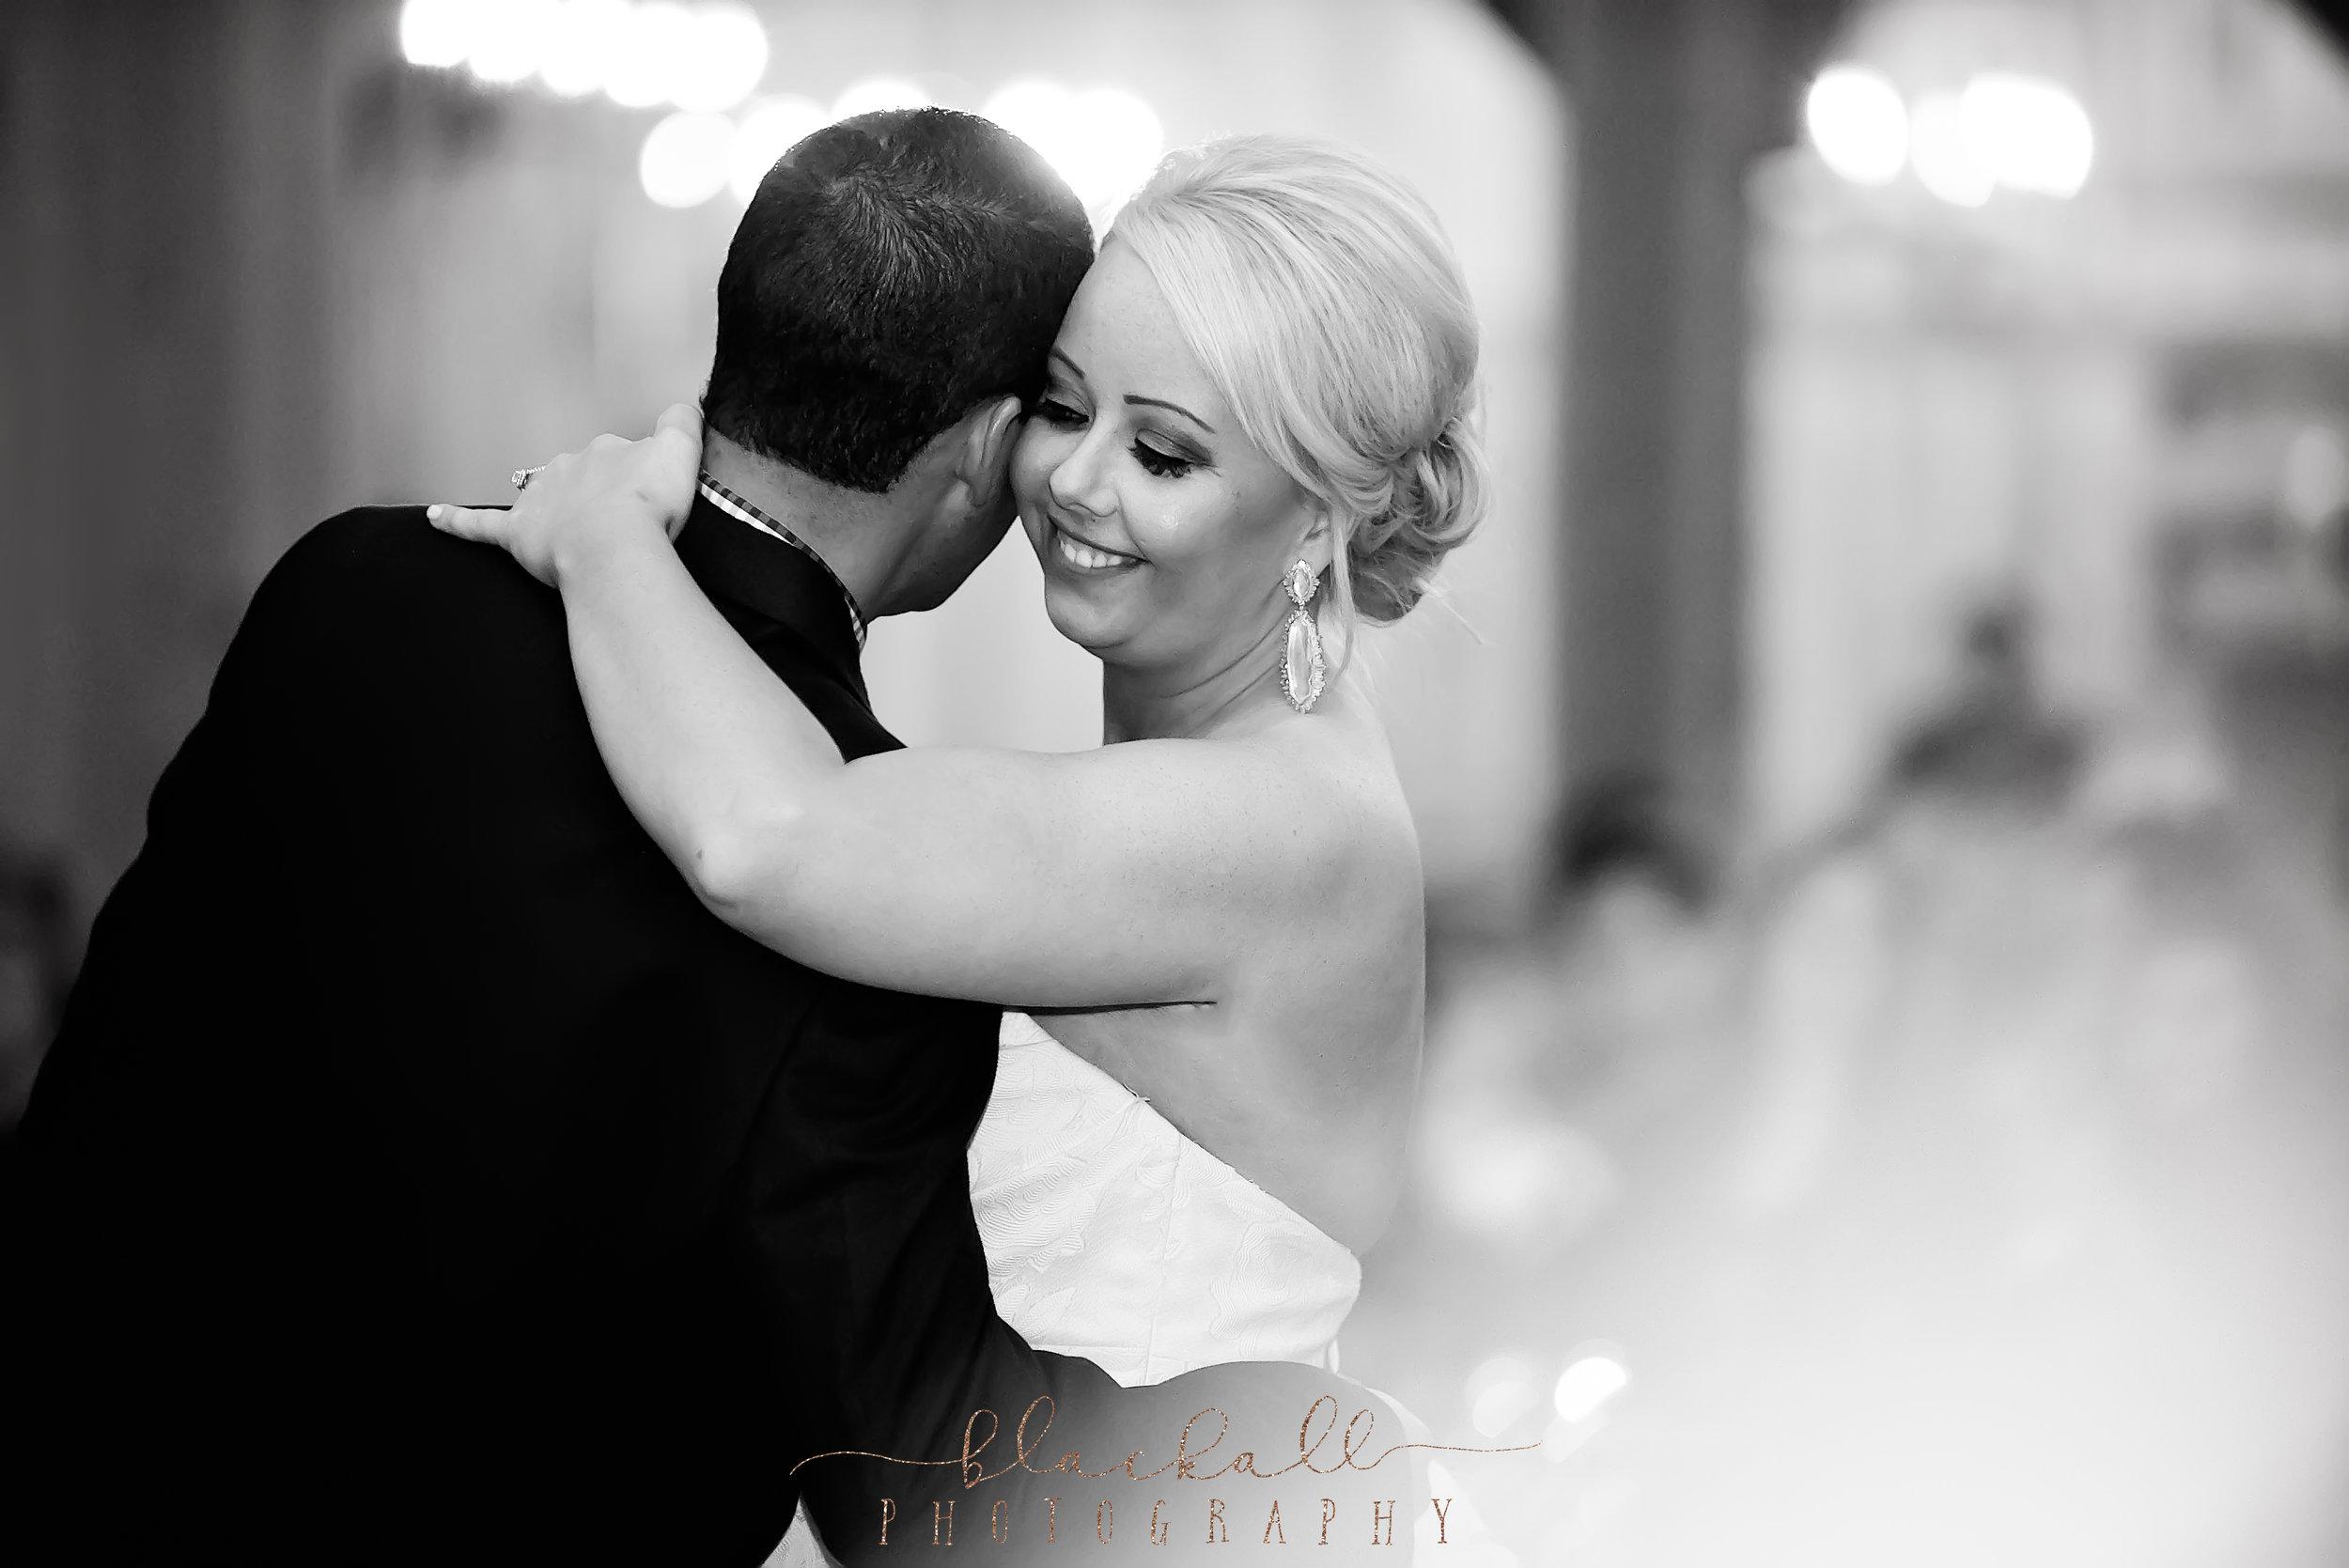 M&M WEDDING_Blackall Photography-56.JPG